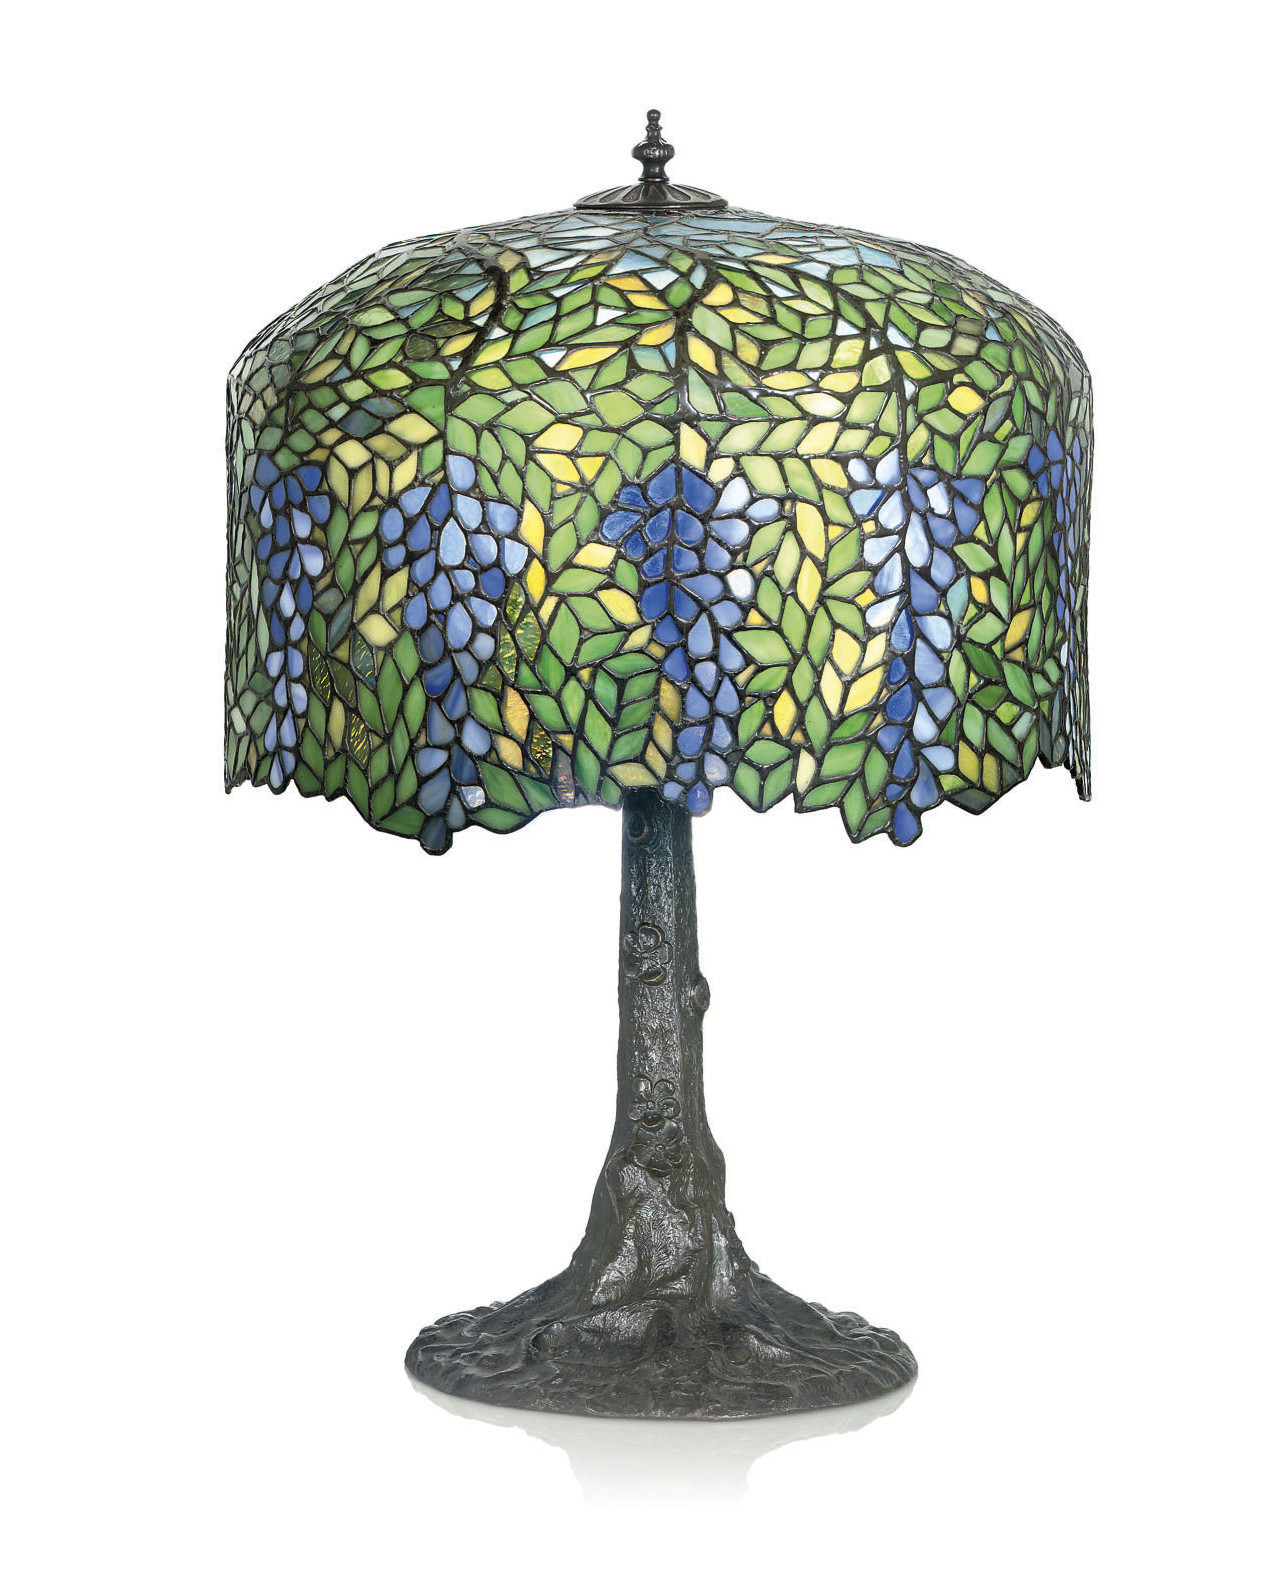 HANDEL LAMP COMPANY (1864-1936